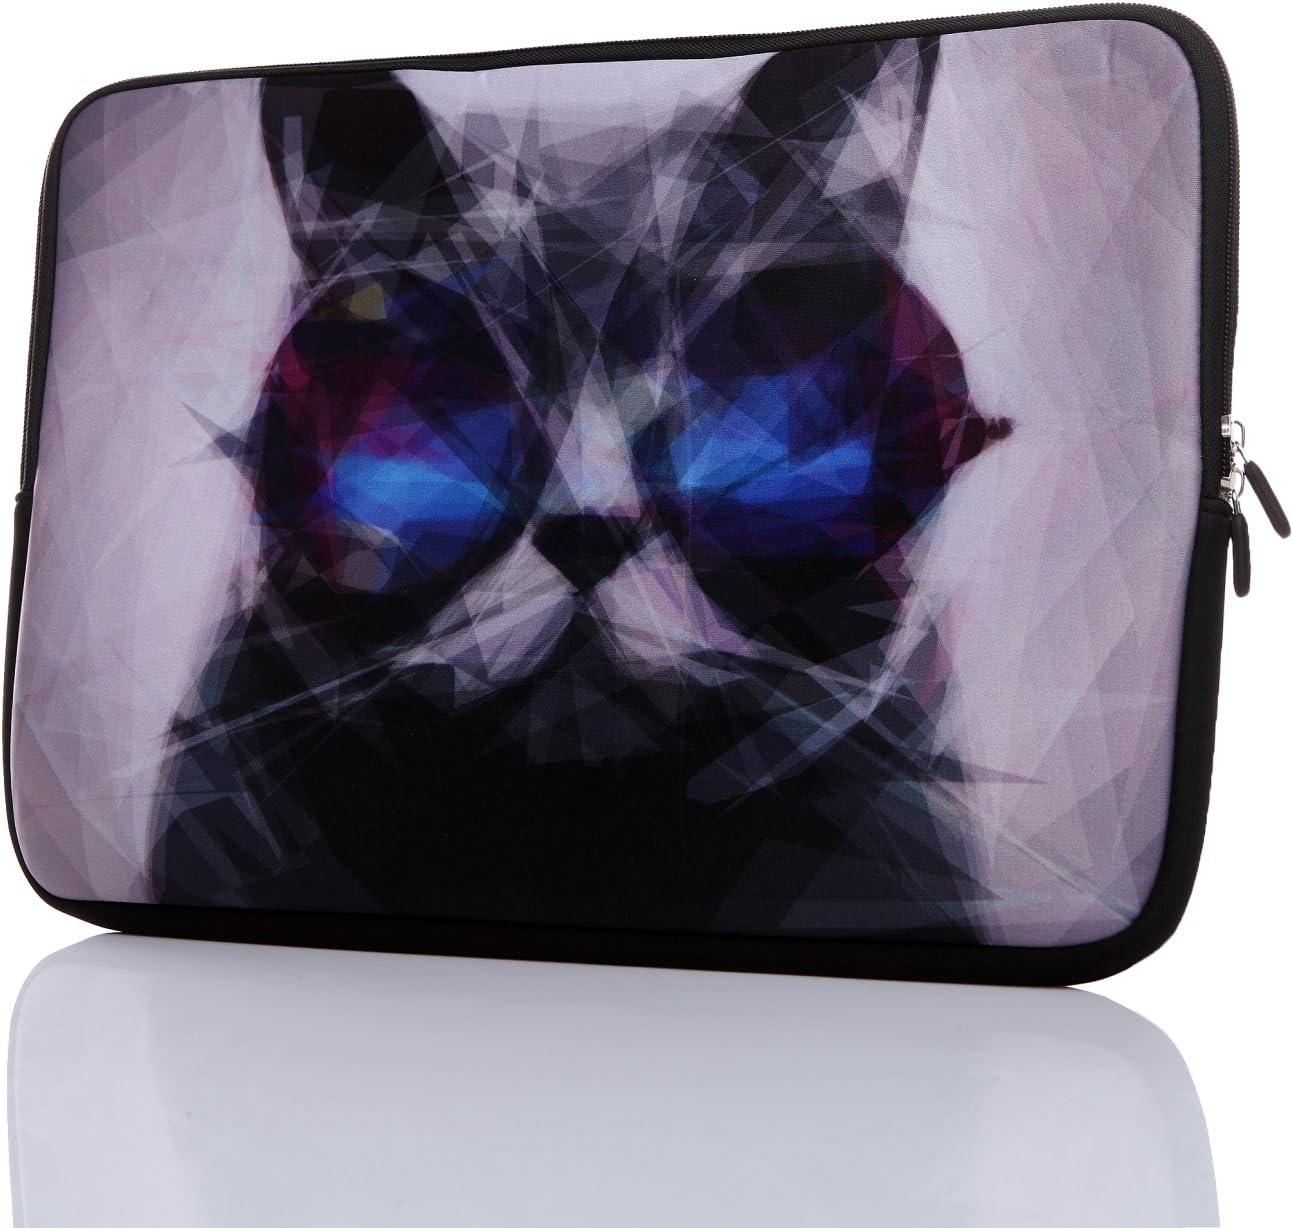 "13.3-Inch to 14-Inch Laptop Neoprene Sleeve Case with Hidden Handle for 12.9 13 13.3 14 14.1"" Inch Men Women Ultrabook/Chromebook/Tablet/Netbook (13.3-14 Inch Grey Cat)"